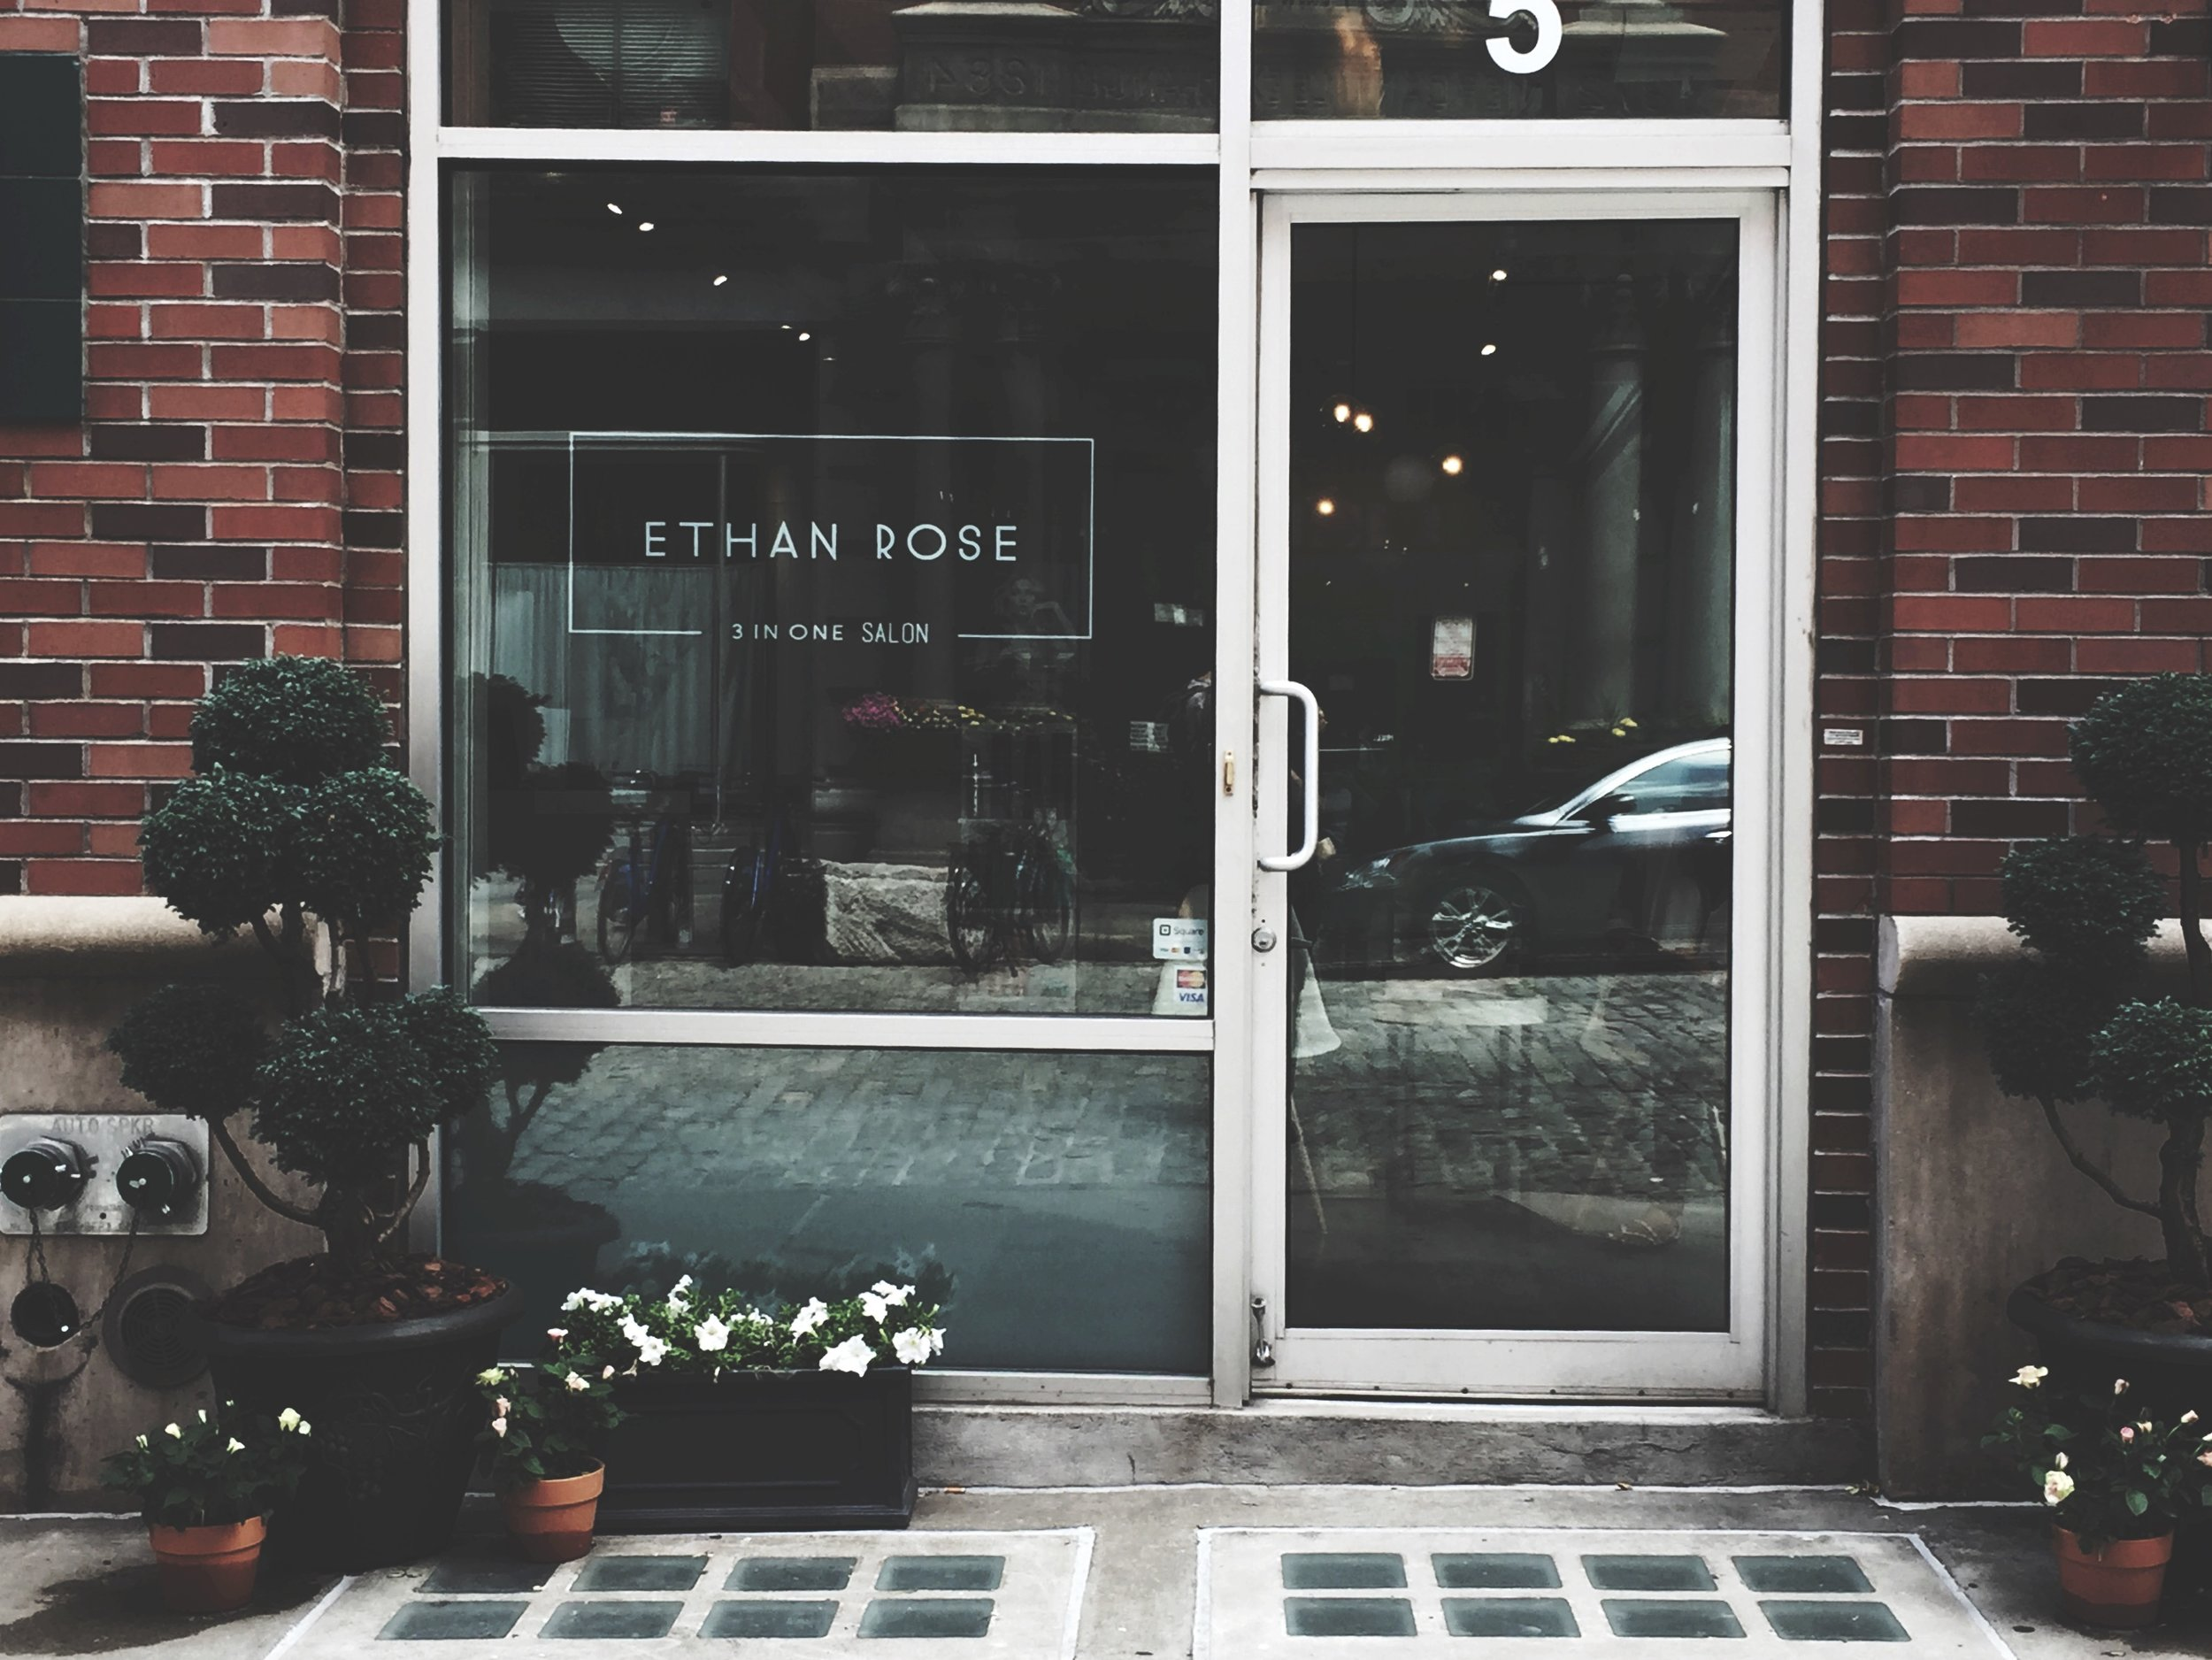 Ethan-Rose-Hair-Beauty-Salon-NYC-outside-72d2db1eda4f963997d6a0f028af8568.JPG